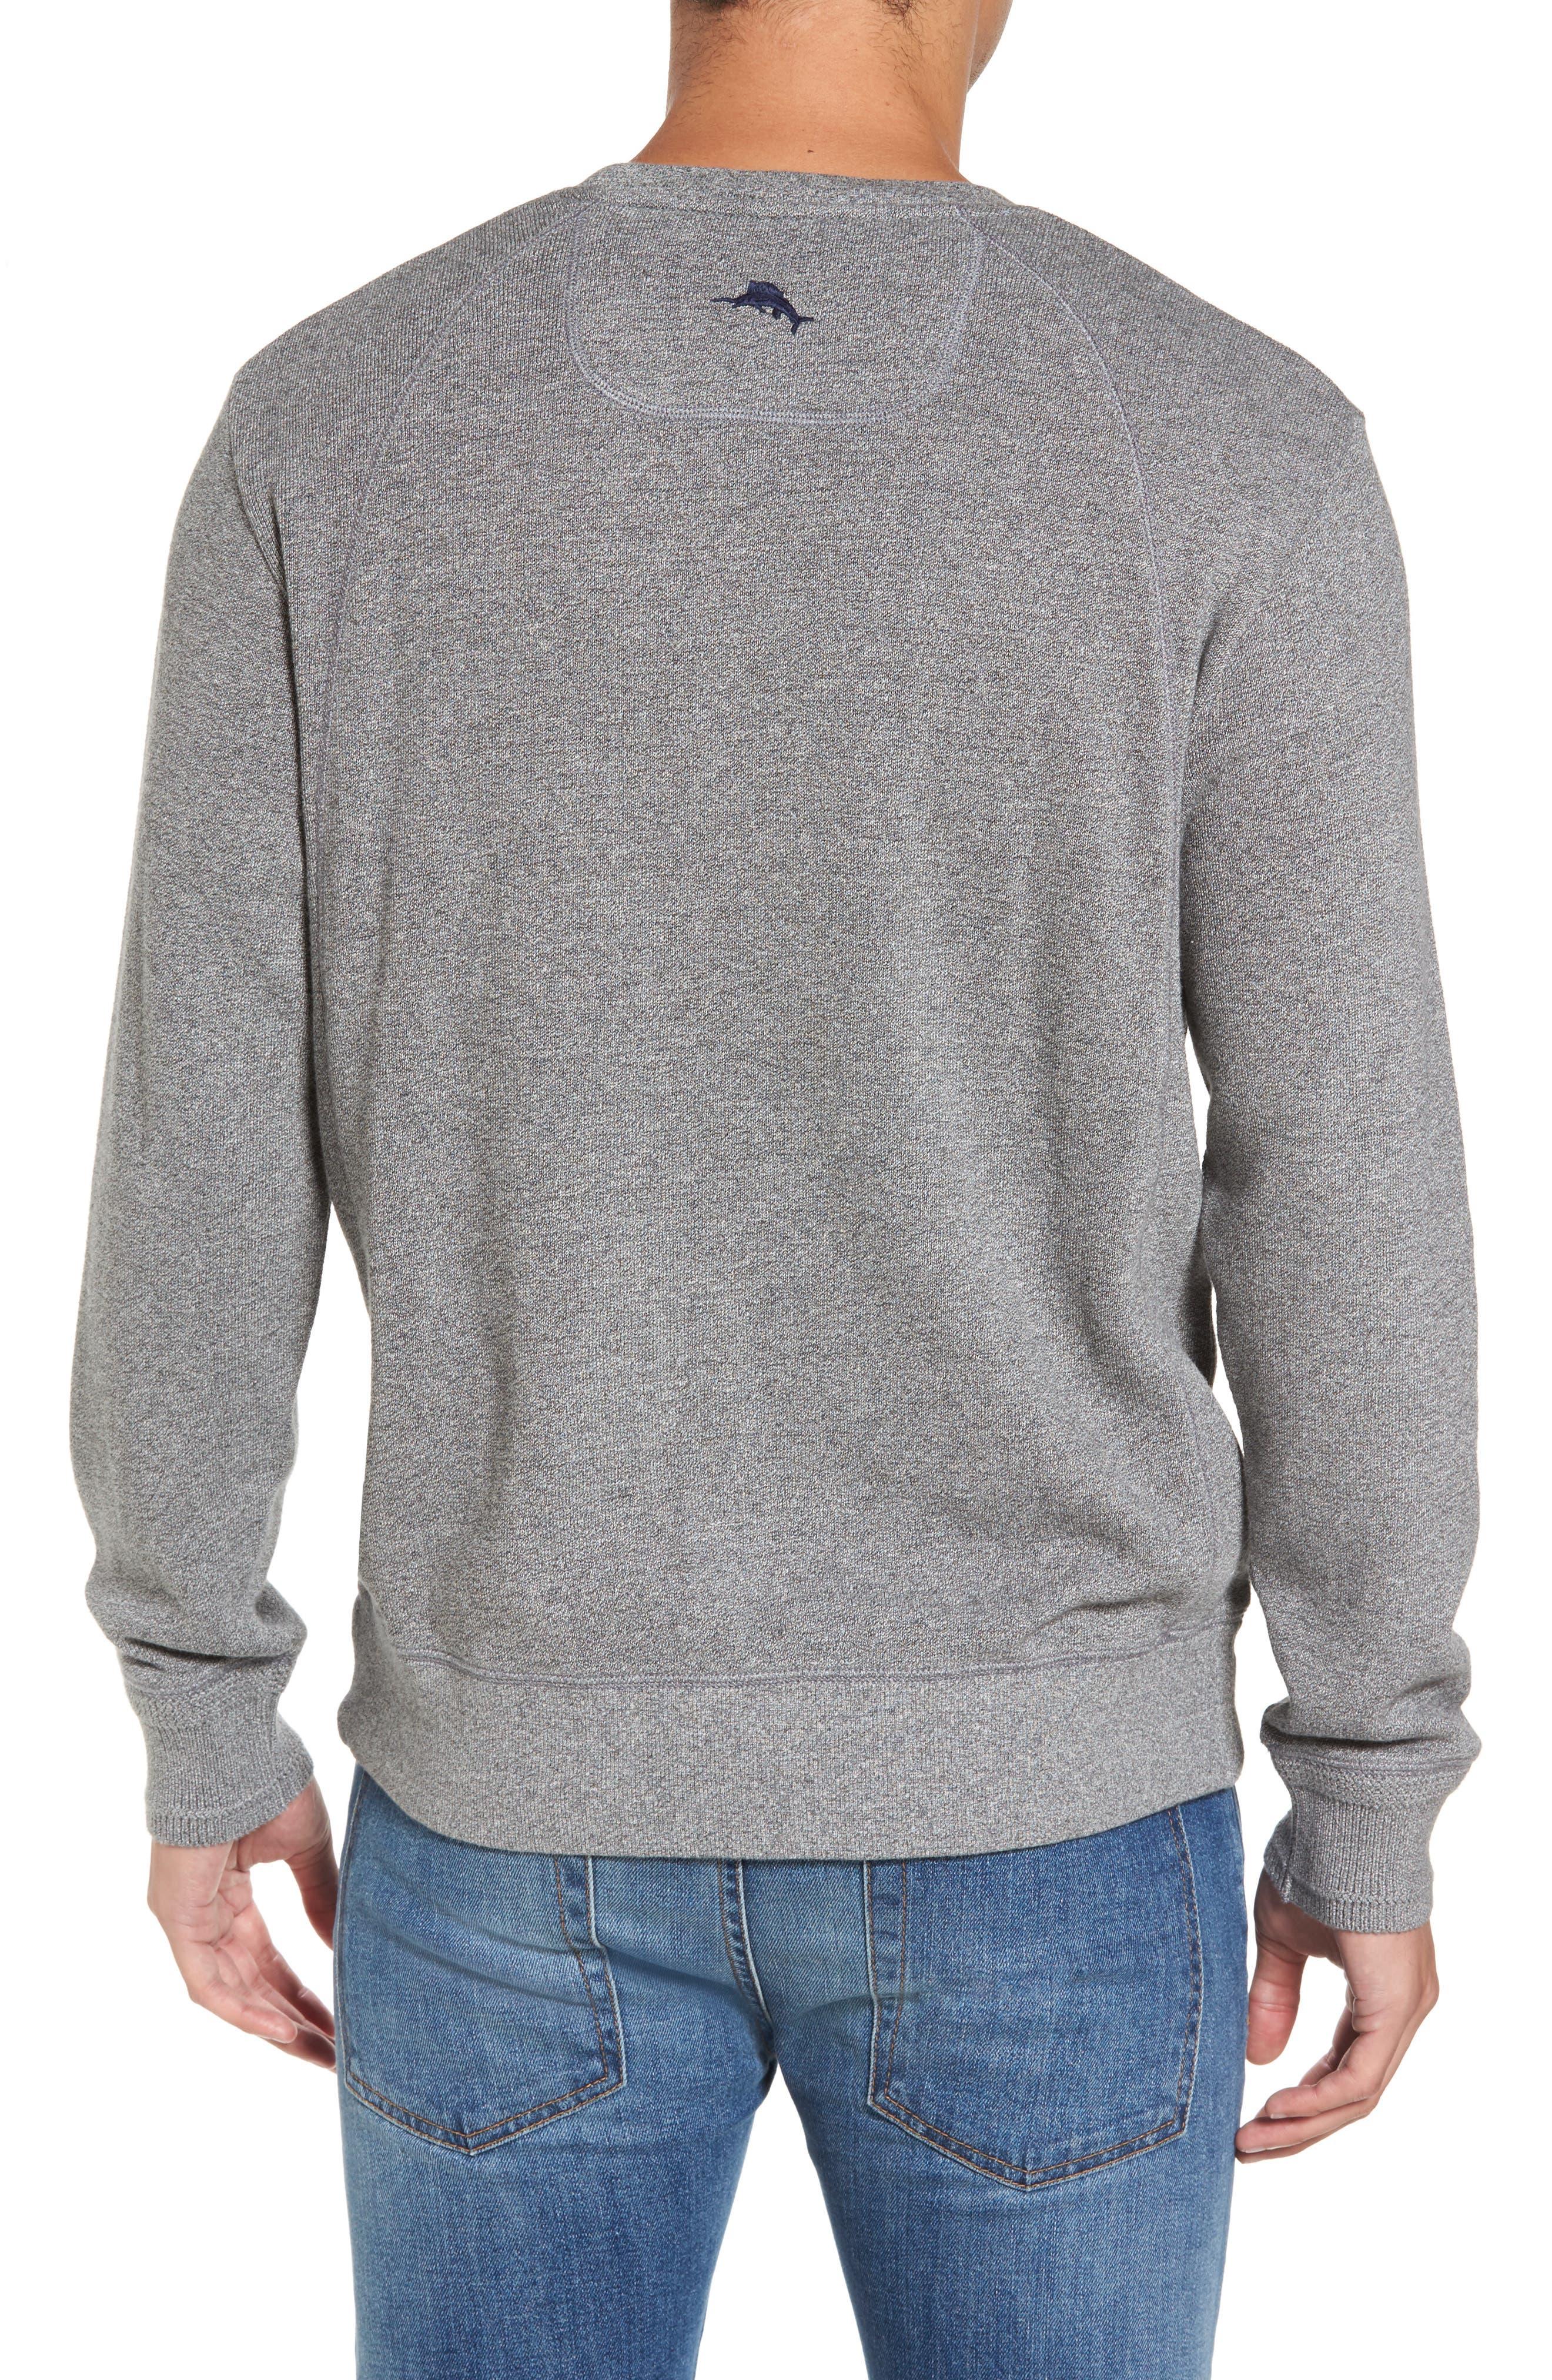 NFL Stitch of Liberty Embroidered Crewneck Sweatshirt,                             Alternate thumbnail 44, color,